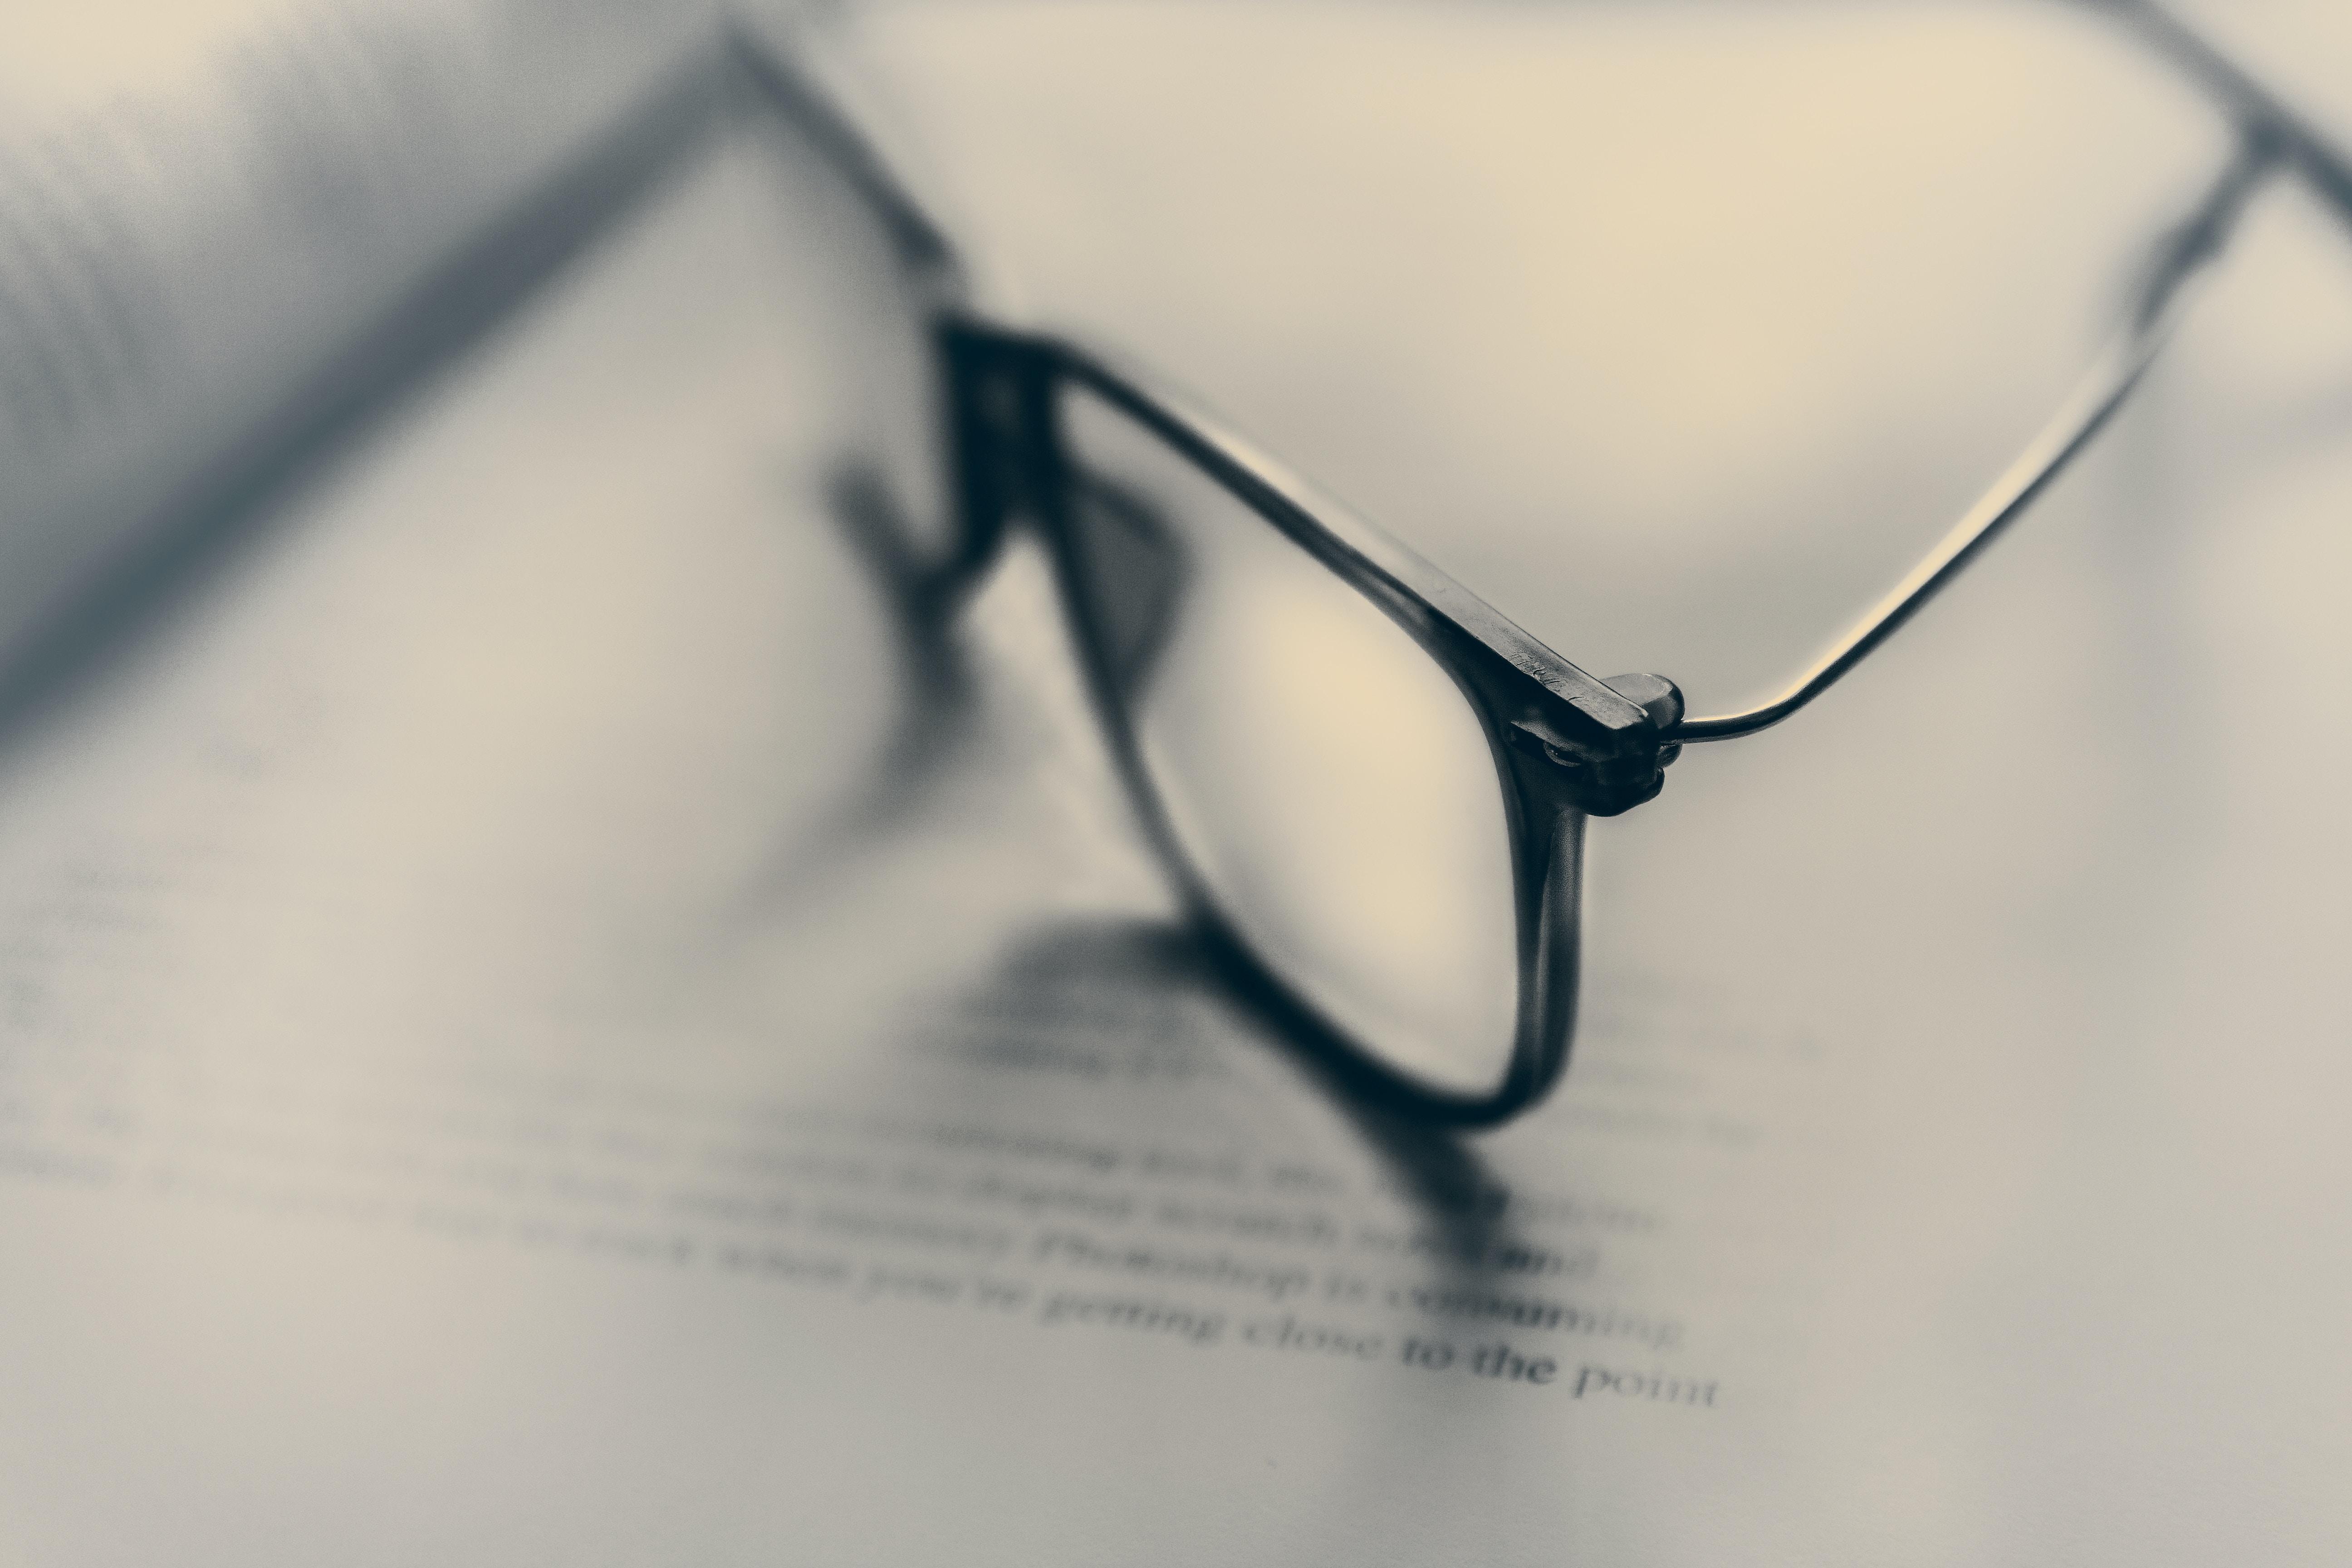 eyeglasses in bokeh photography